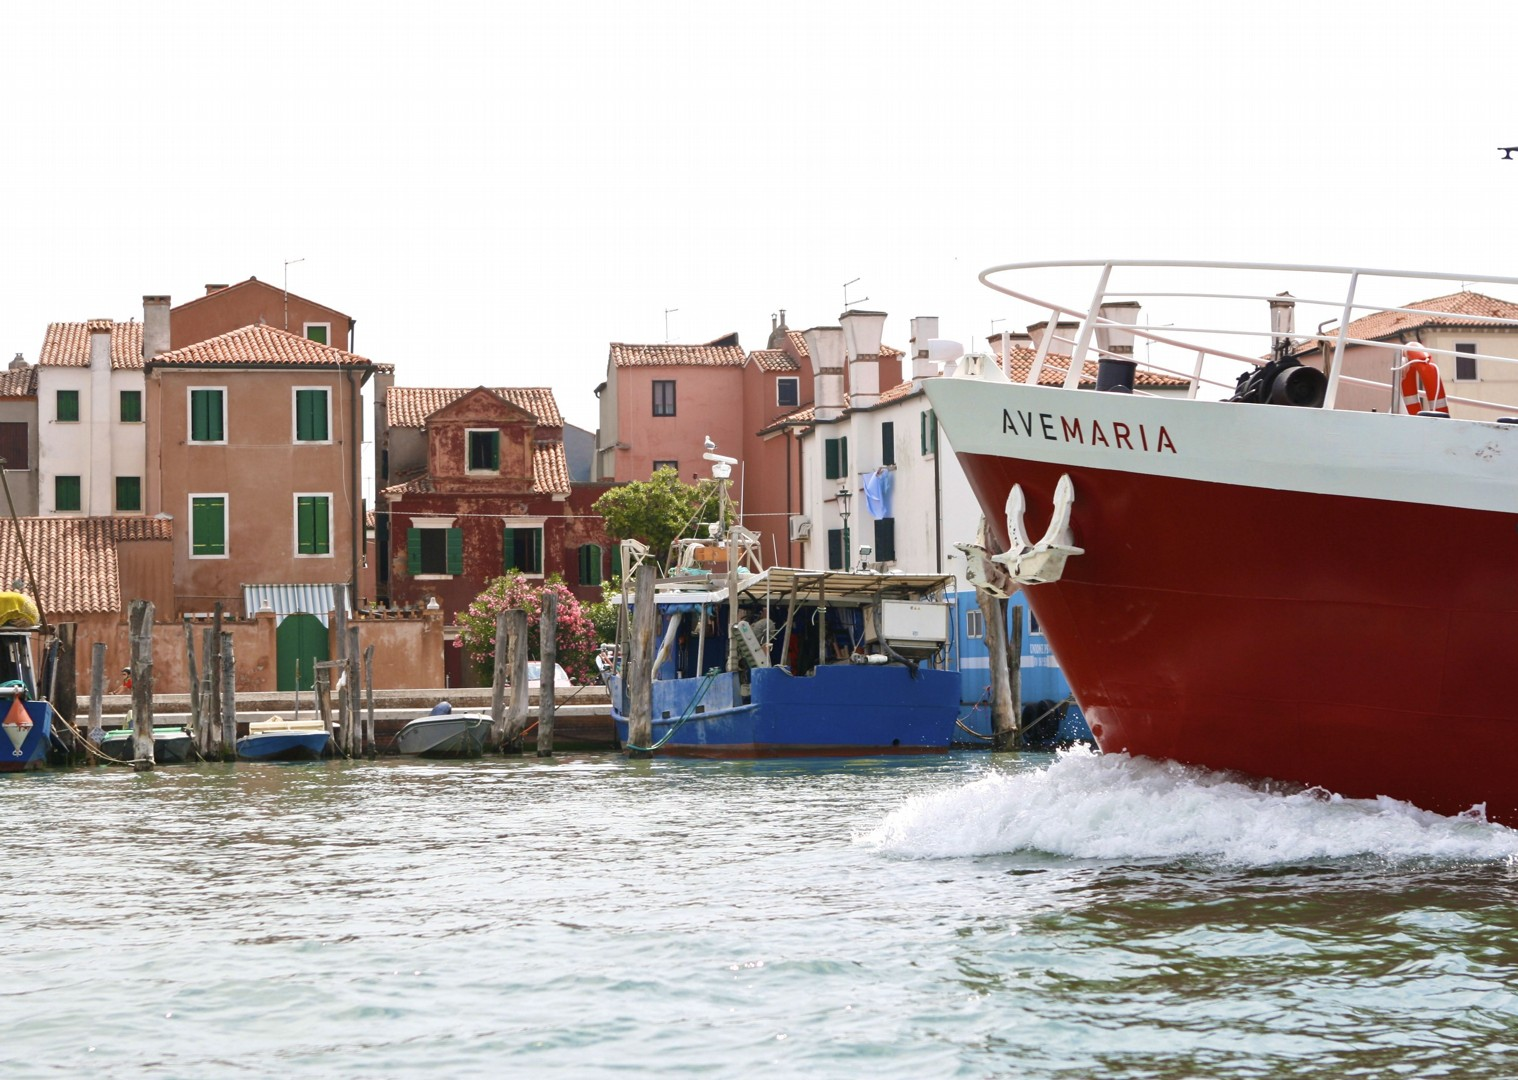 waterwaysofvenice2.jpg - Italy - Venetian Waterways (Venice to Mantova) - Bike and Barge Holiday - Leisure Cycling